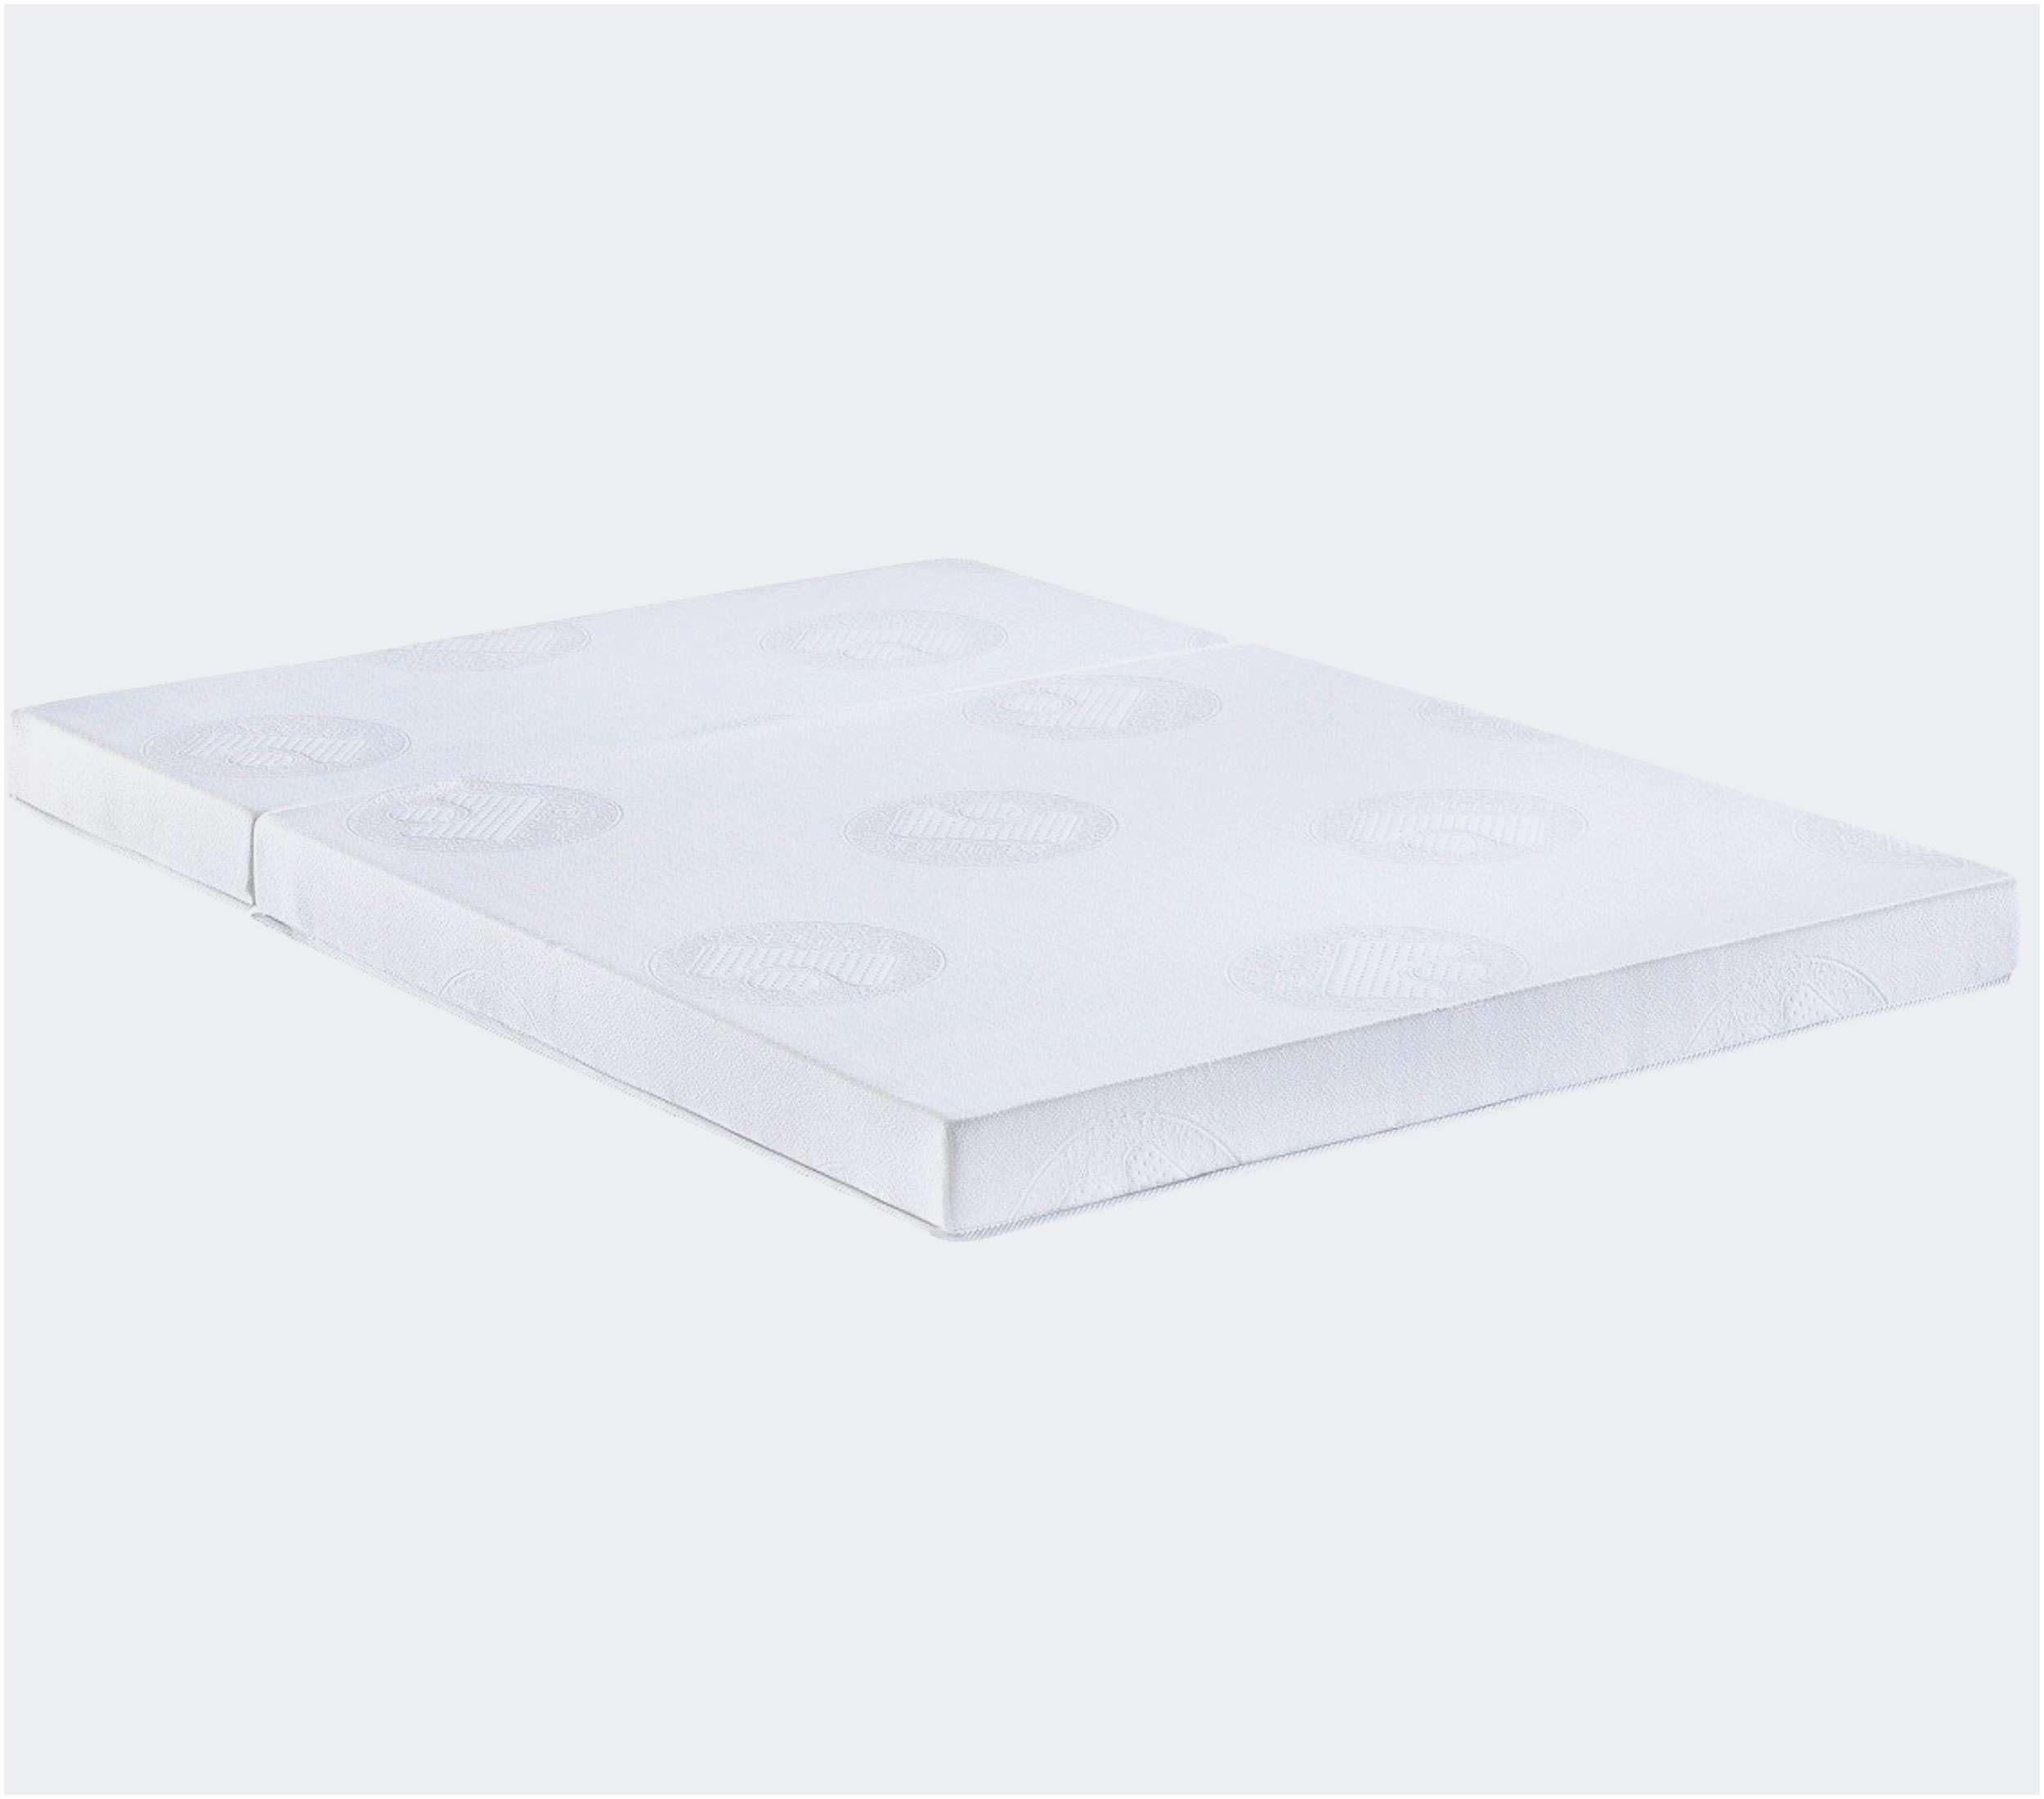 Lit Une Place Et Demi Ikea Luxe 61 sommier 200×200 Ikea Vue Jongor4hire